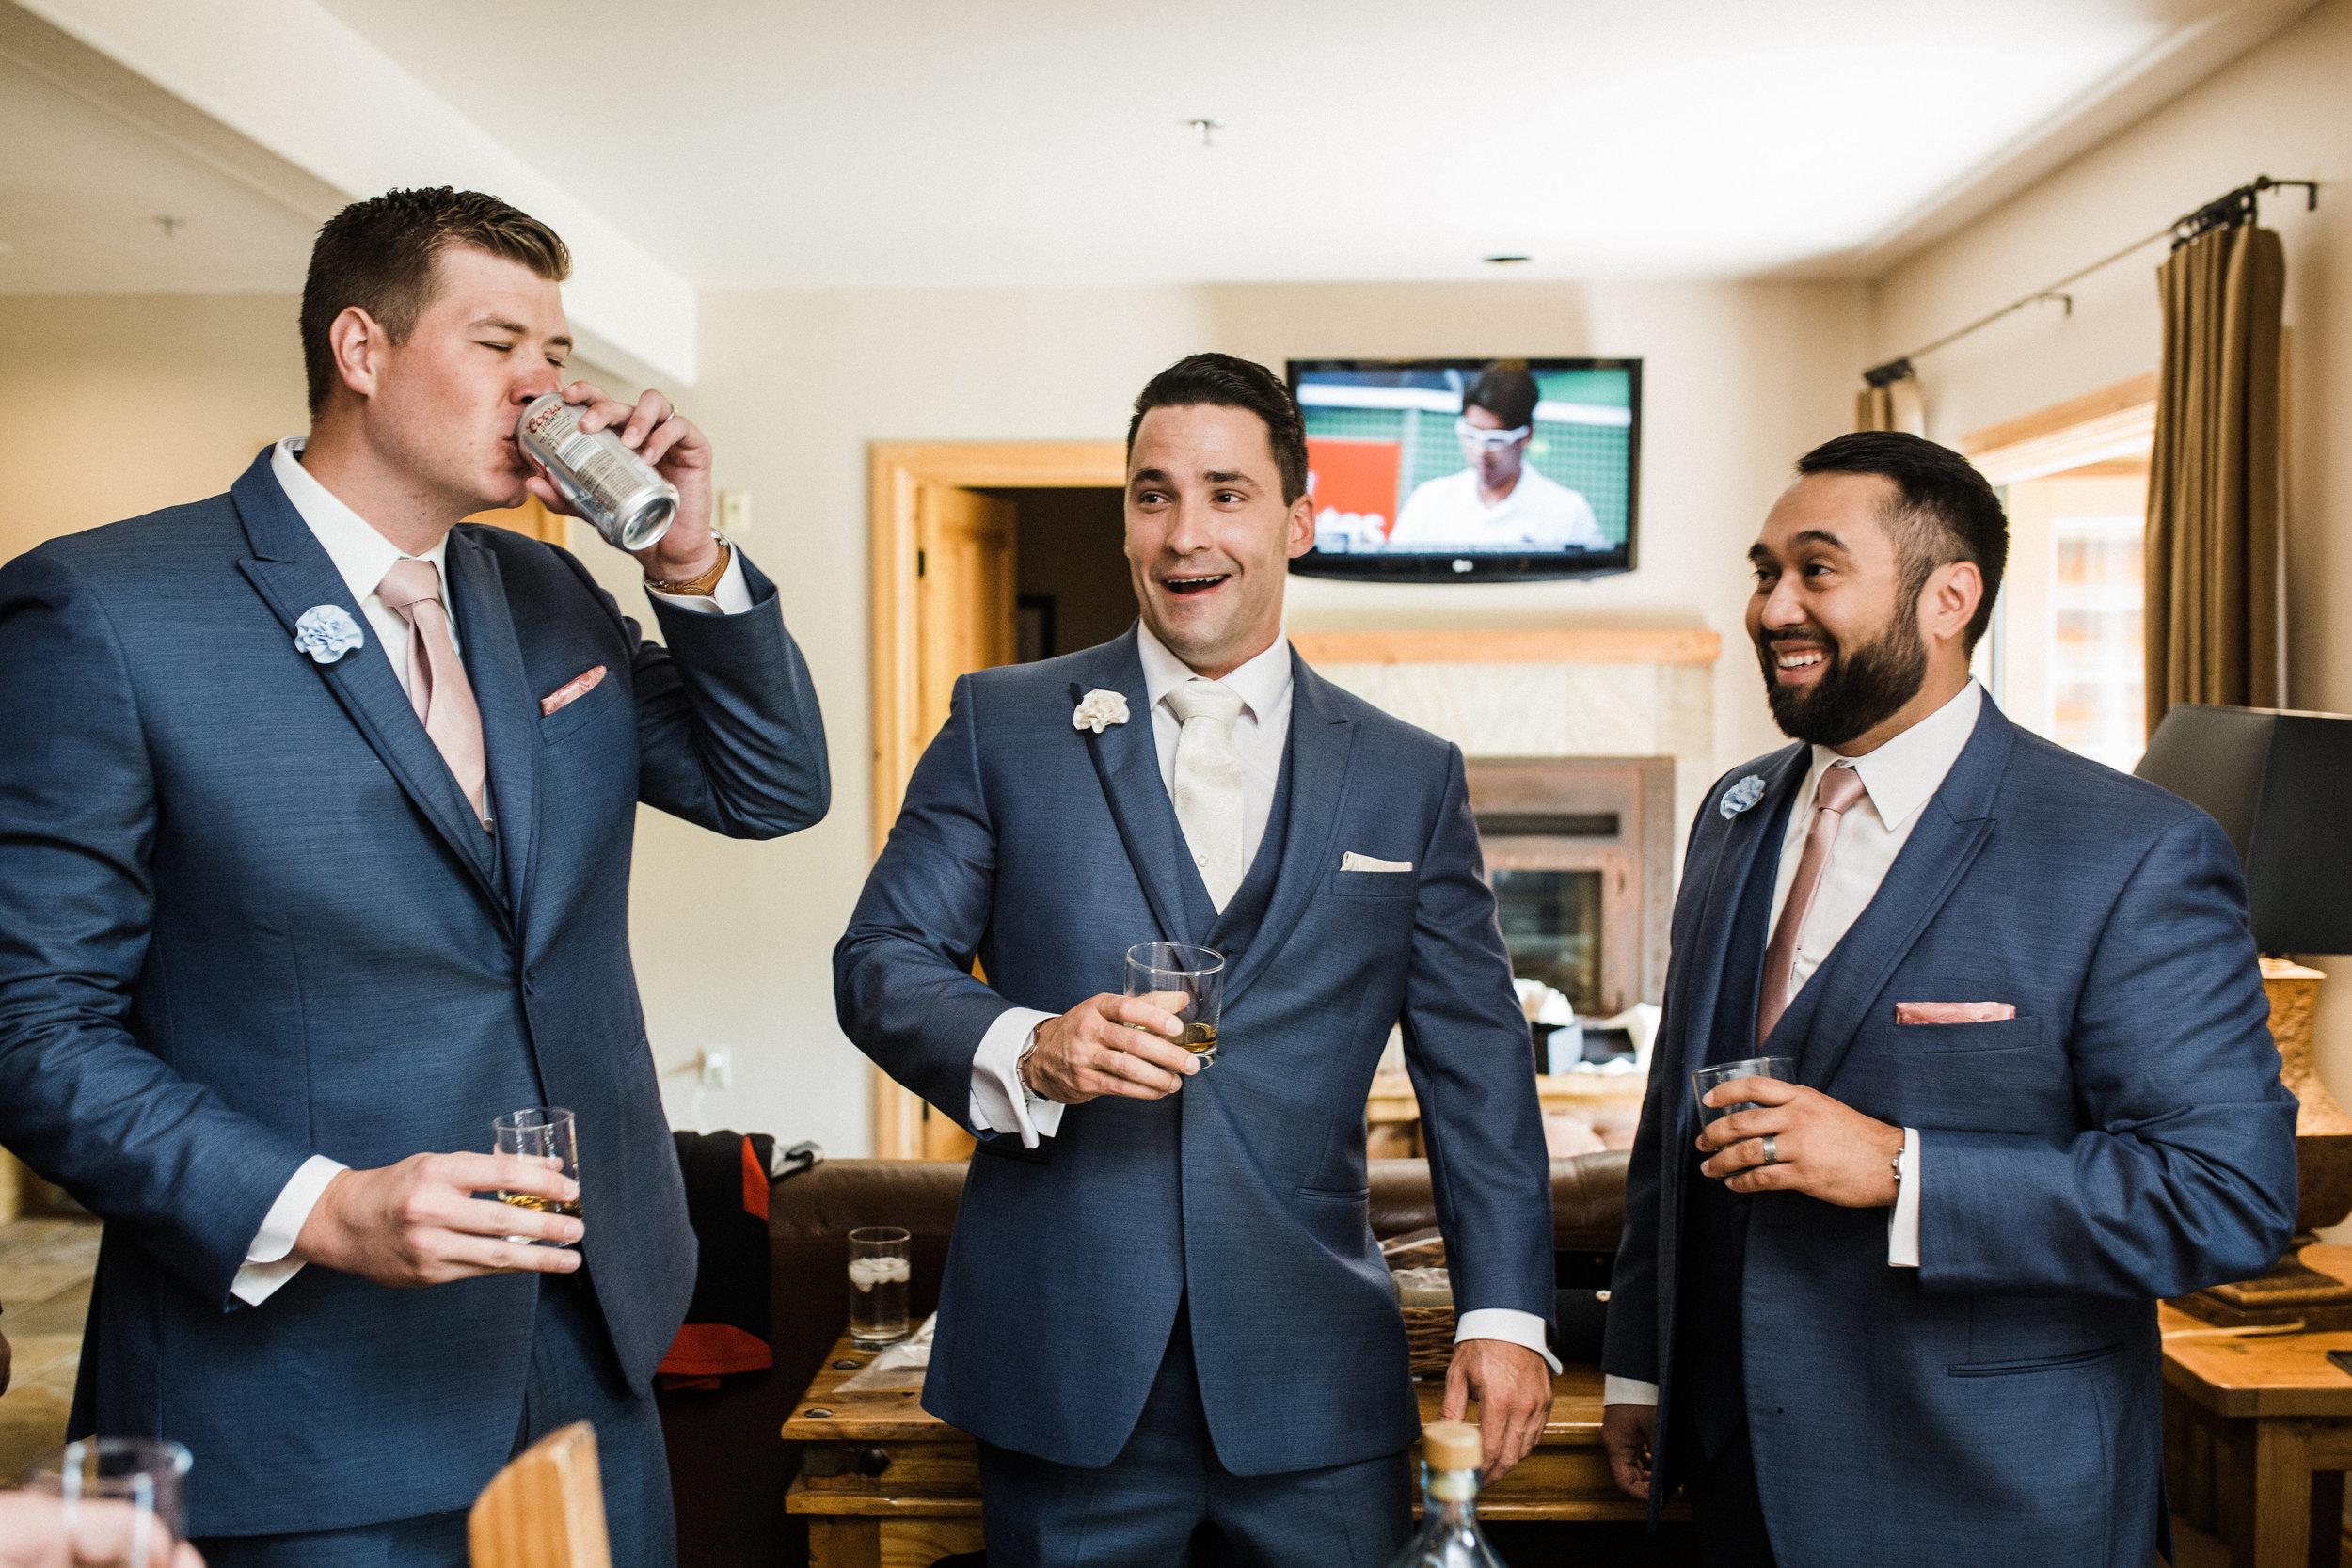 leahandashton-telluride-wedding-photography-0032.jpg